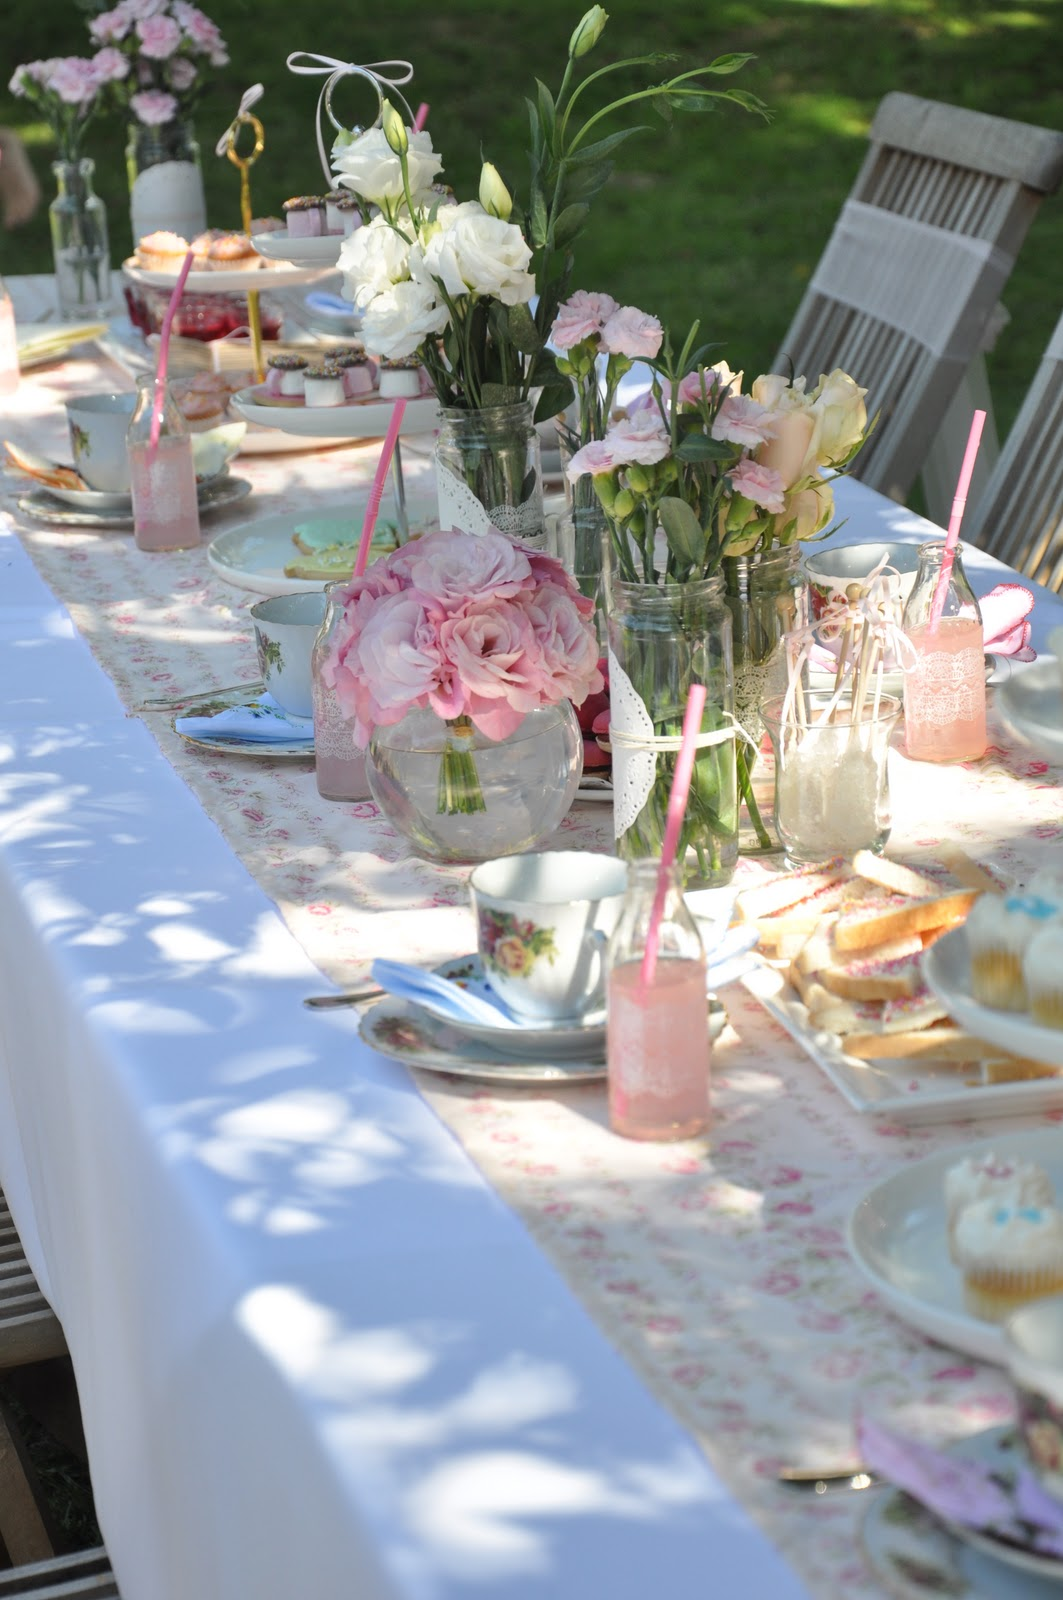 The vintage garden tea party asian wedding ideas summer setting inspiration - Gartenparty dekoration ...